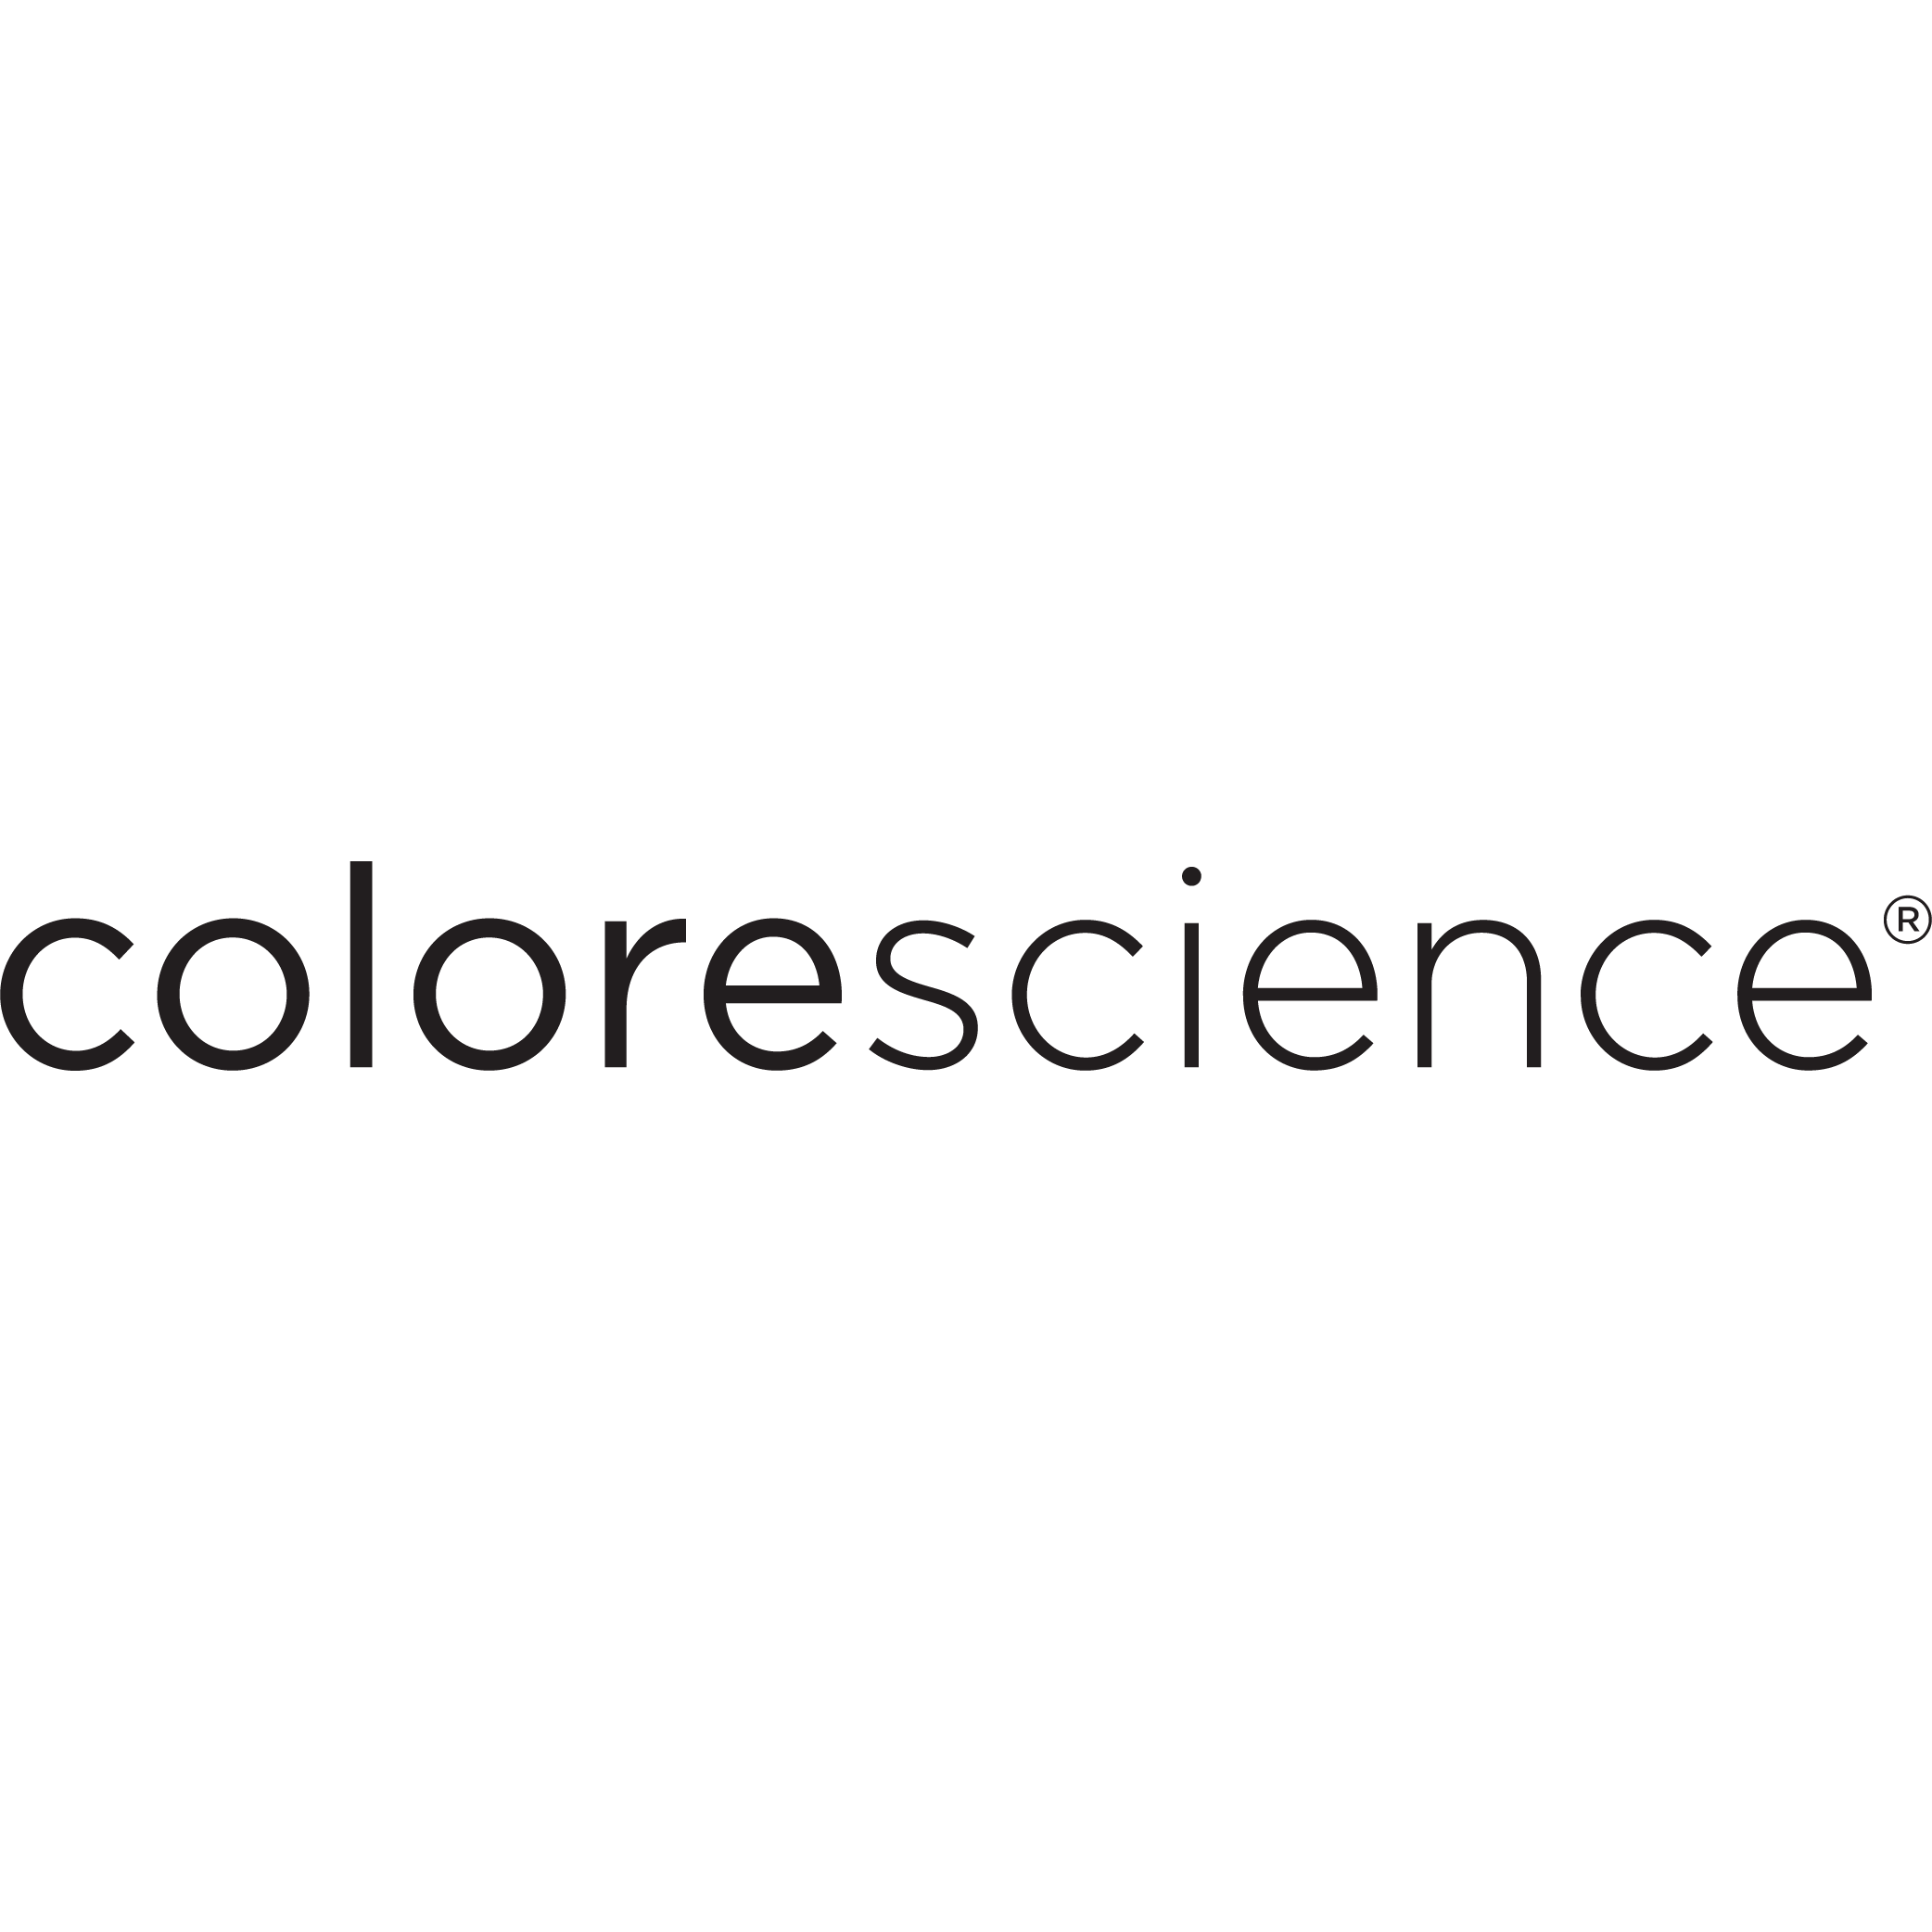 Colorescience-logo-black.png